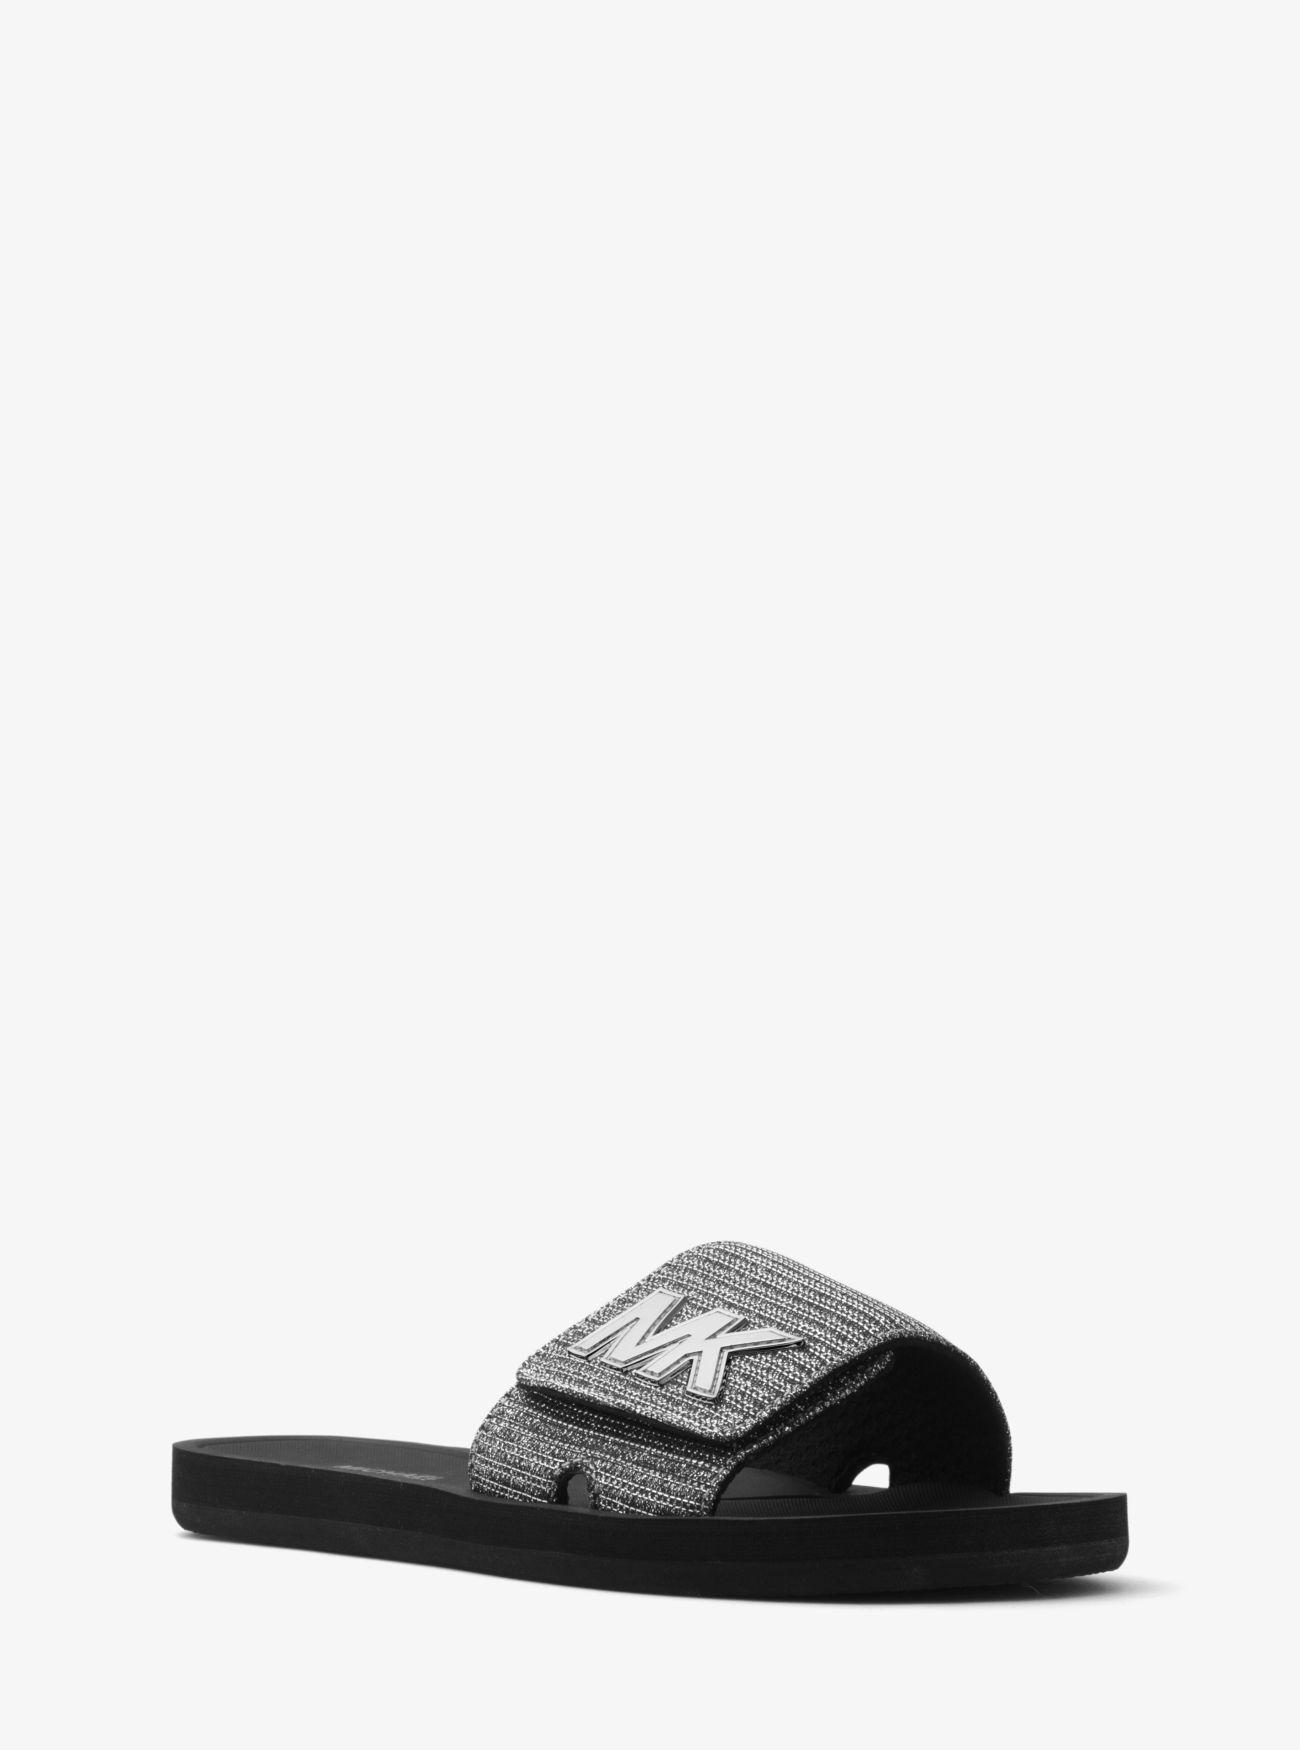 d27a1739c10c Lyst - MICHAEL Michael Kors Mk Logo Chain Mesh Slide in Metallic